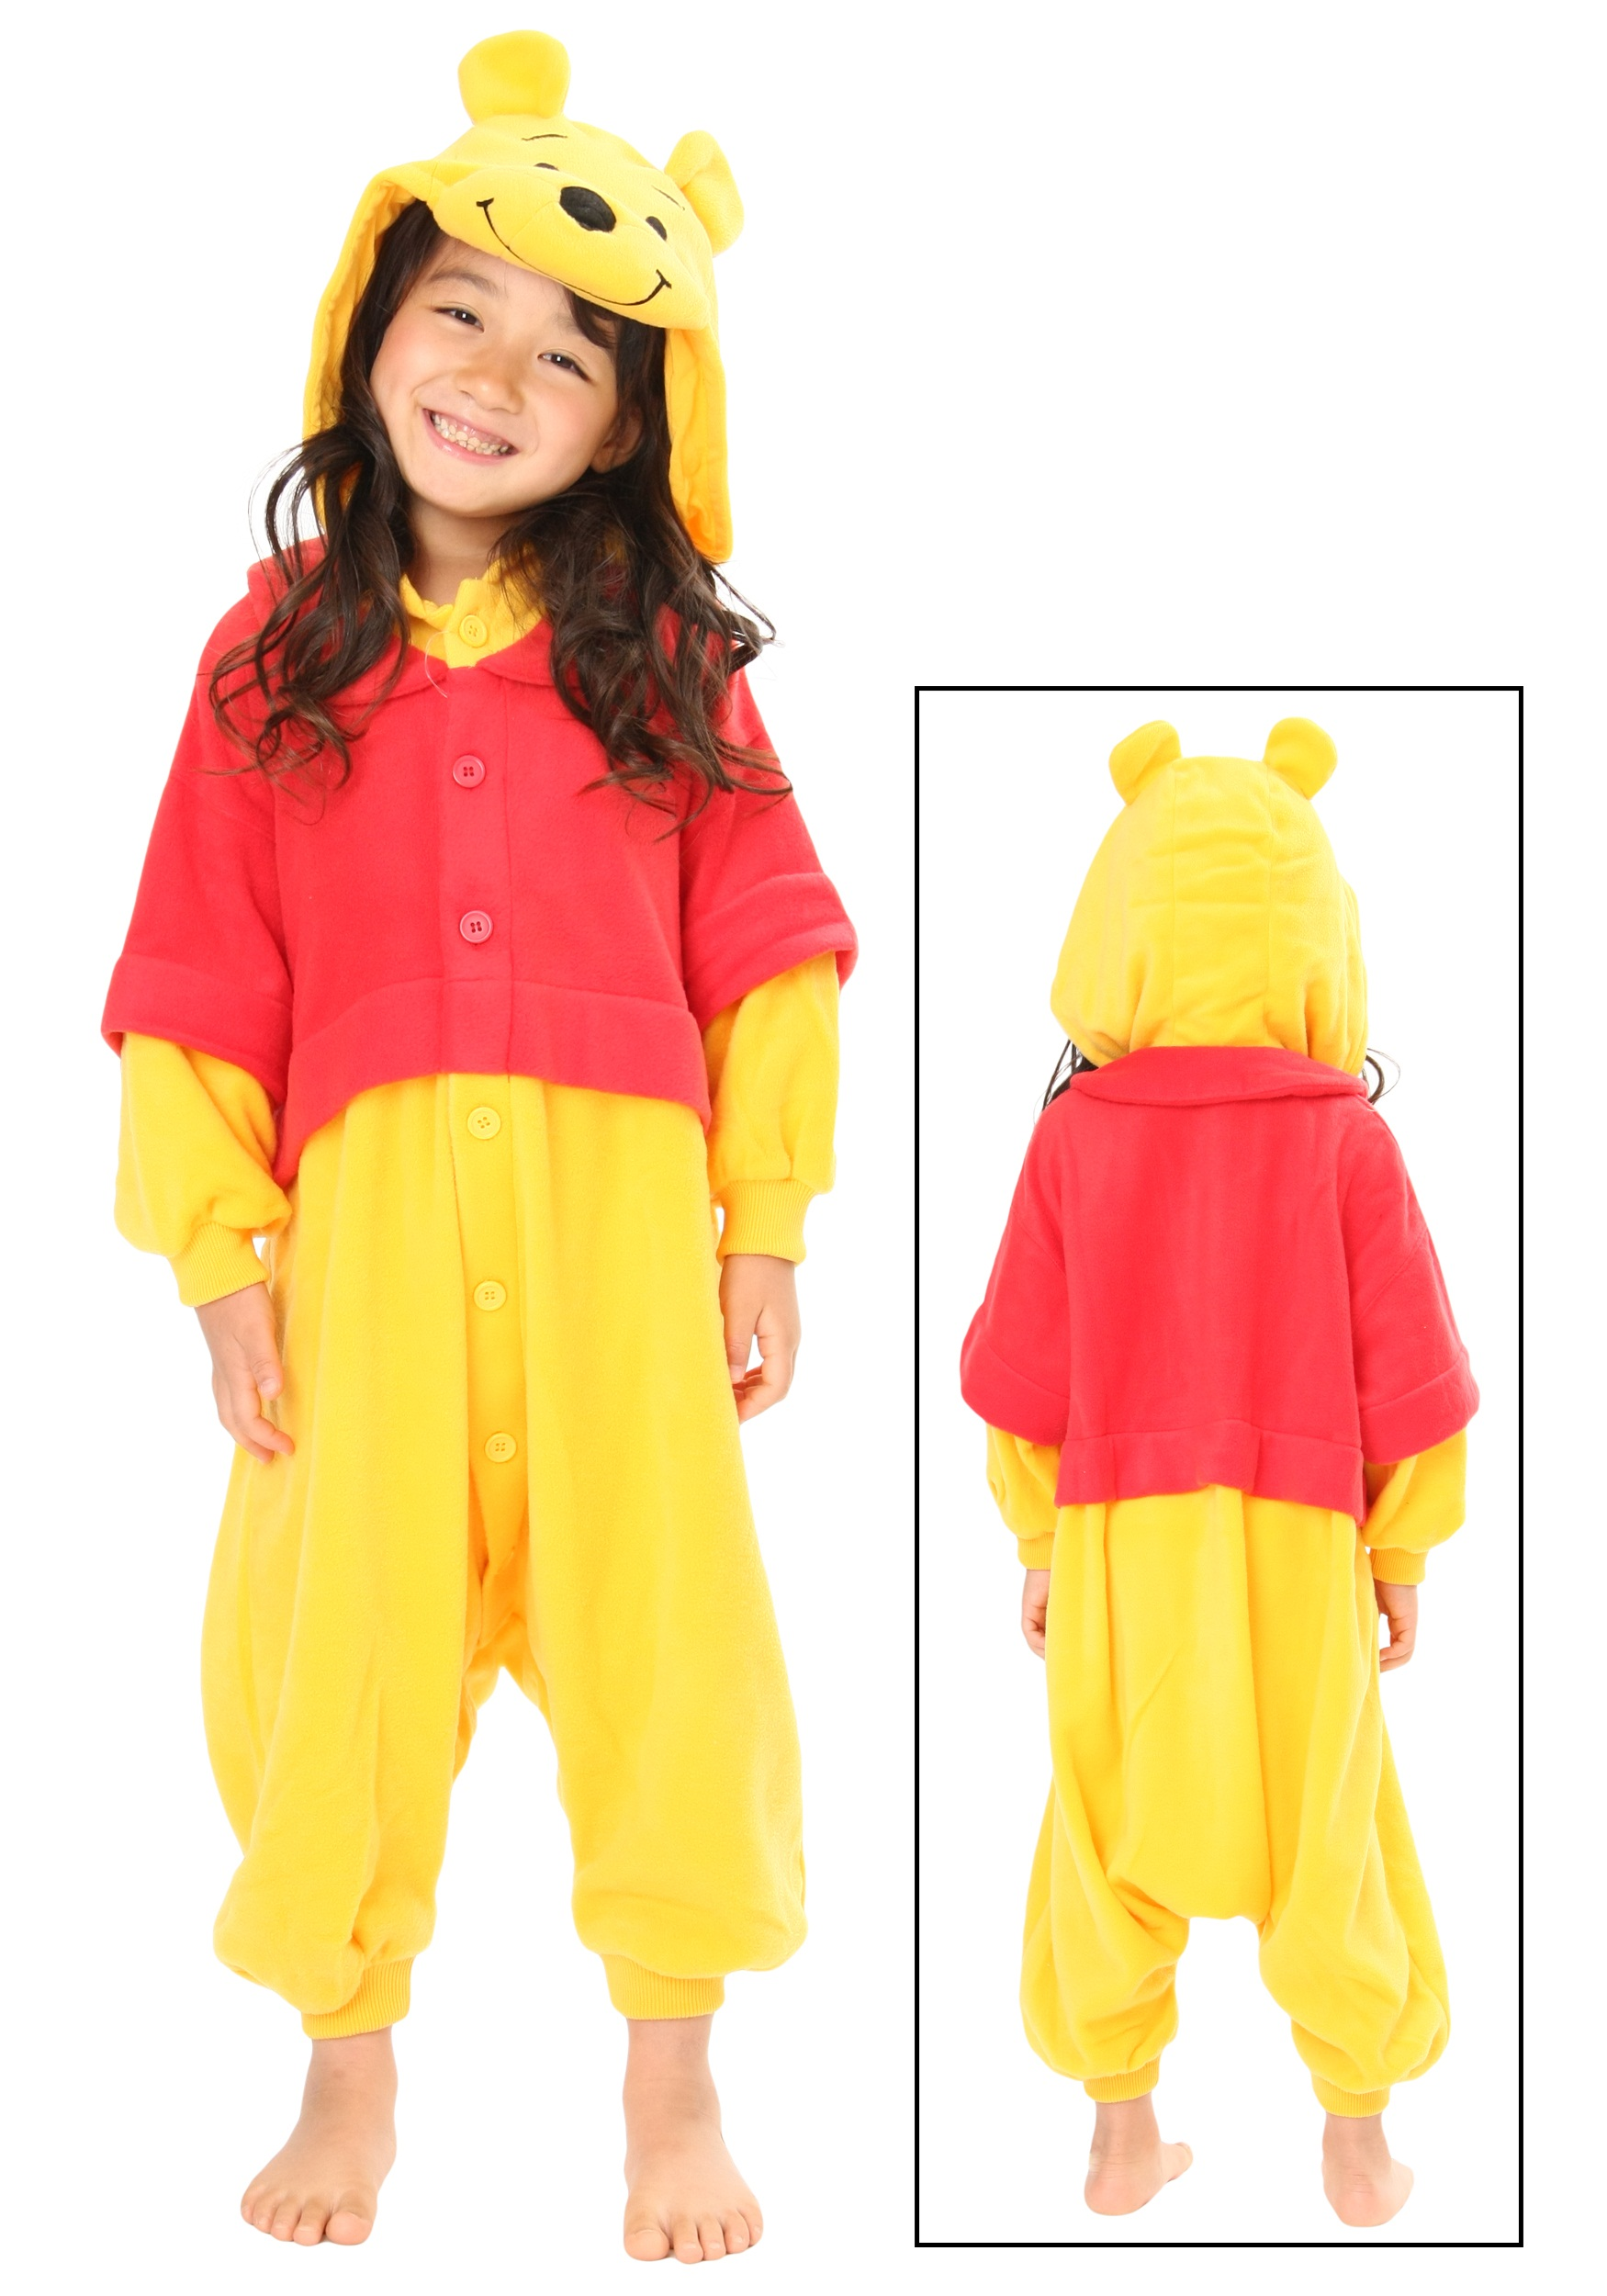 d7380c4456 Winnie the Pooh Costumes